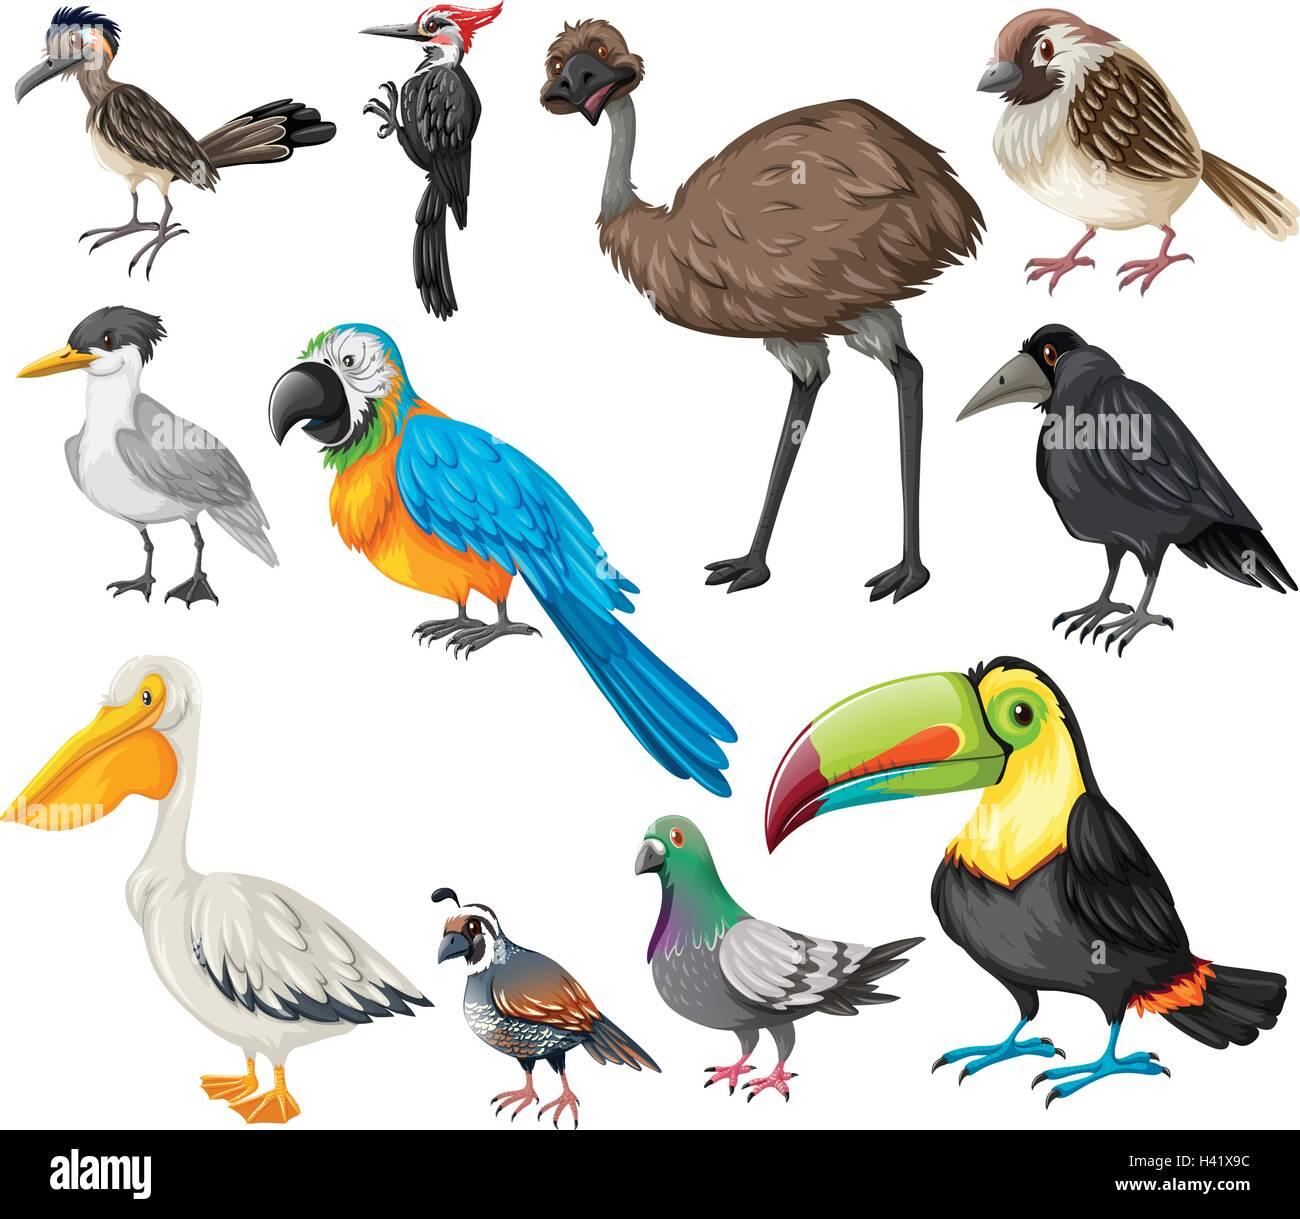 Different Types Of Wild Birds Illustration Stock Vector